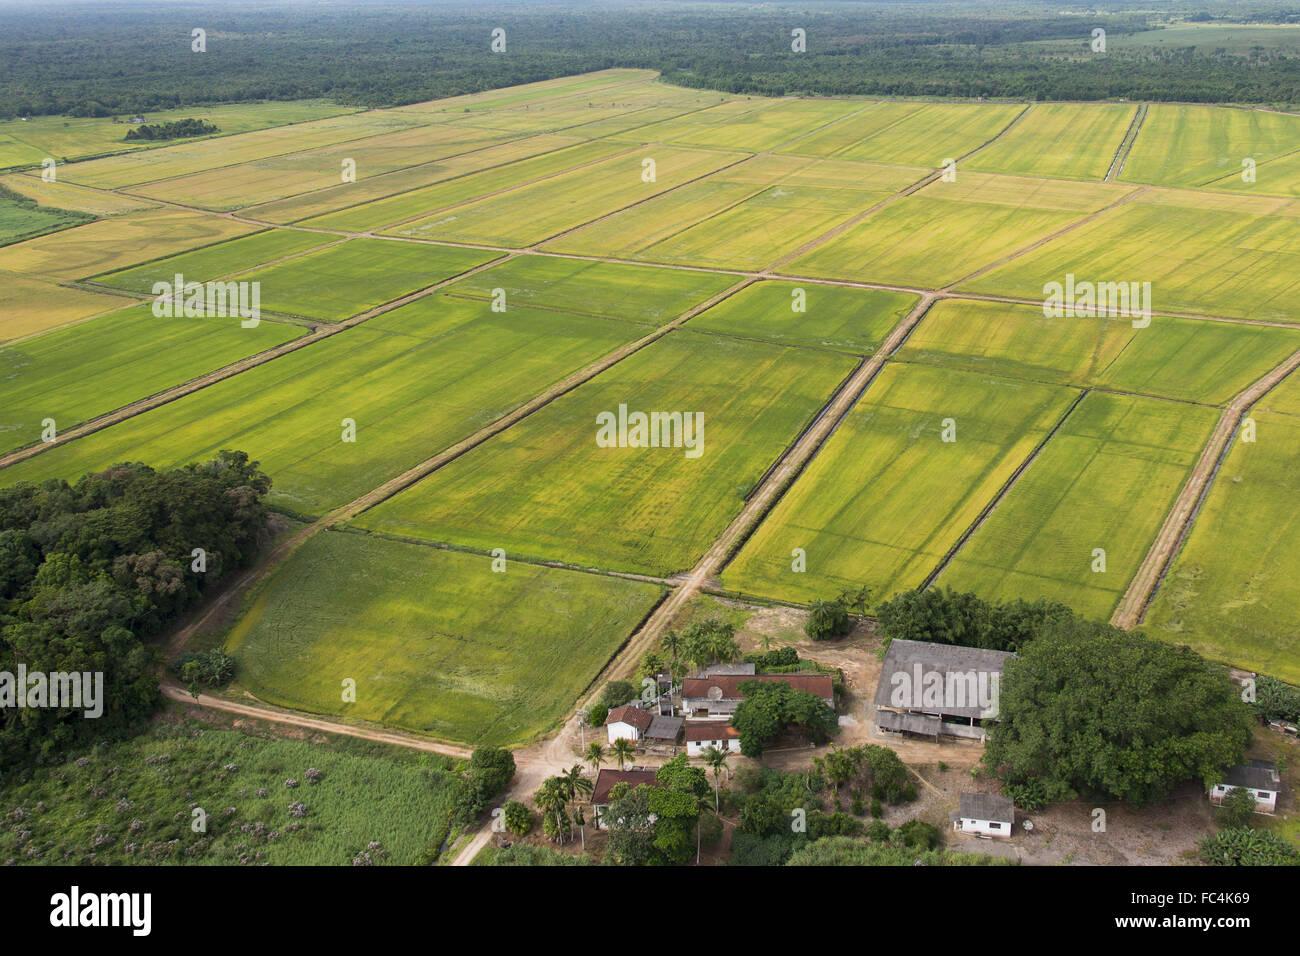 Plantation of rice in coastal plain and thirst farm in rural Iguape - Stock Image